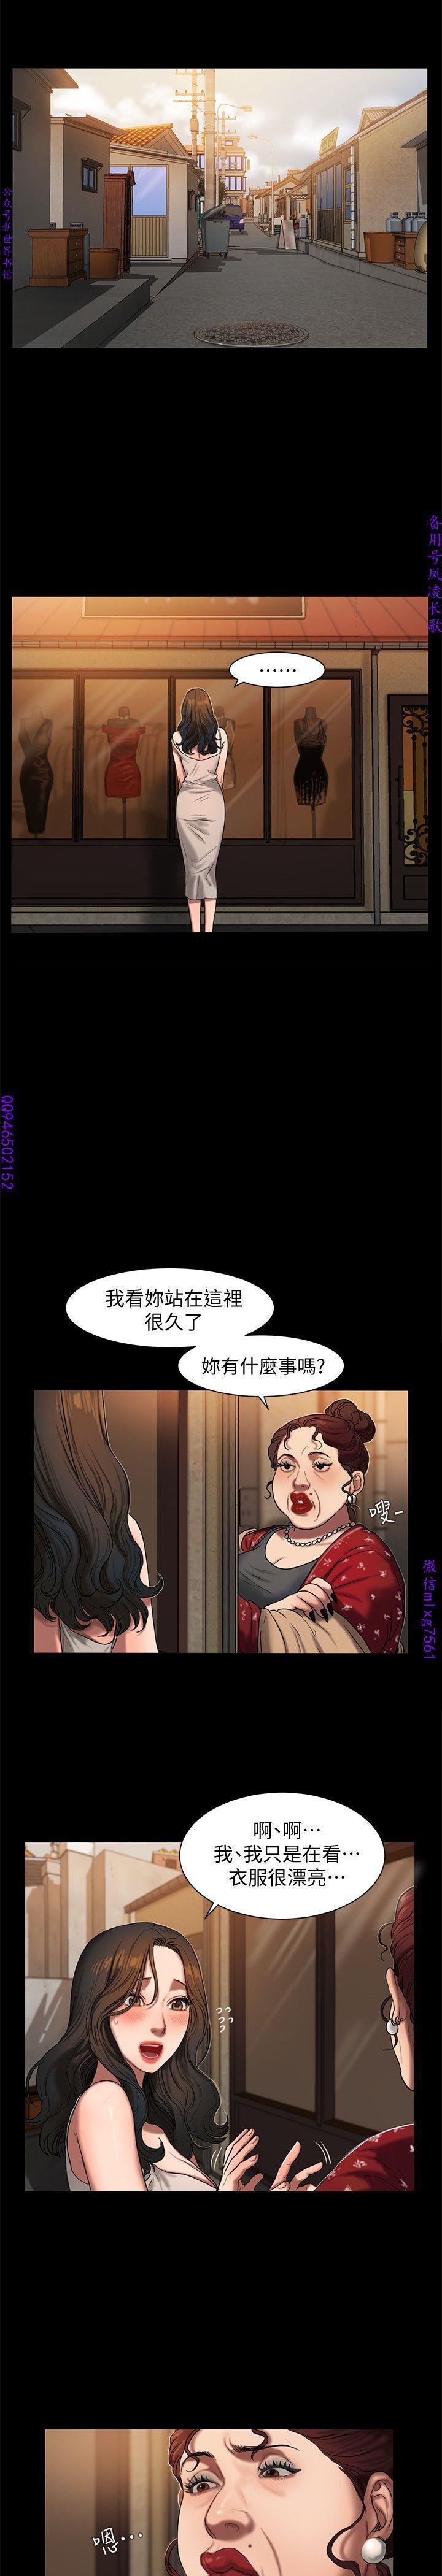 Run away 1-10【中文】 14